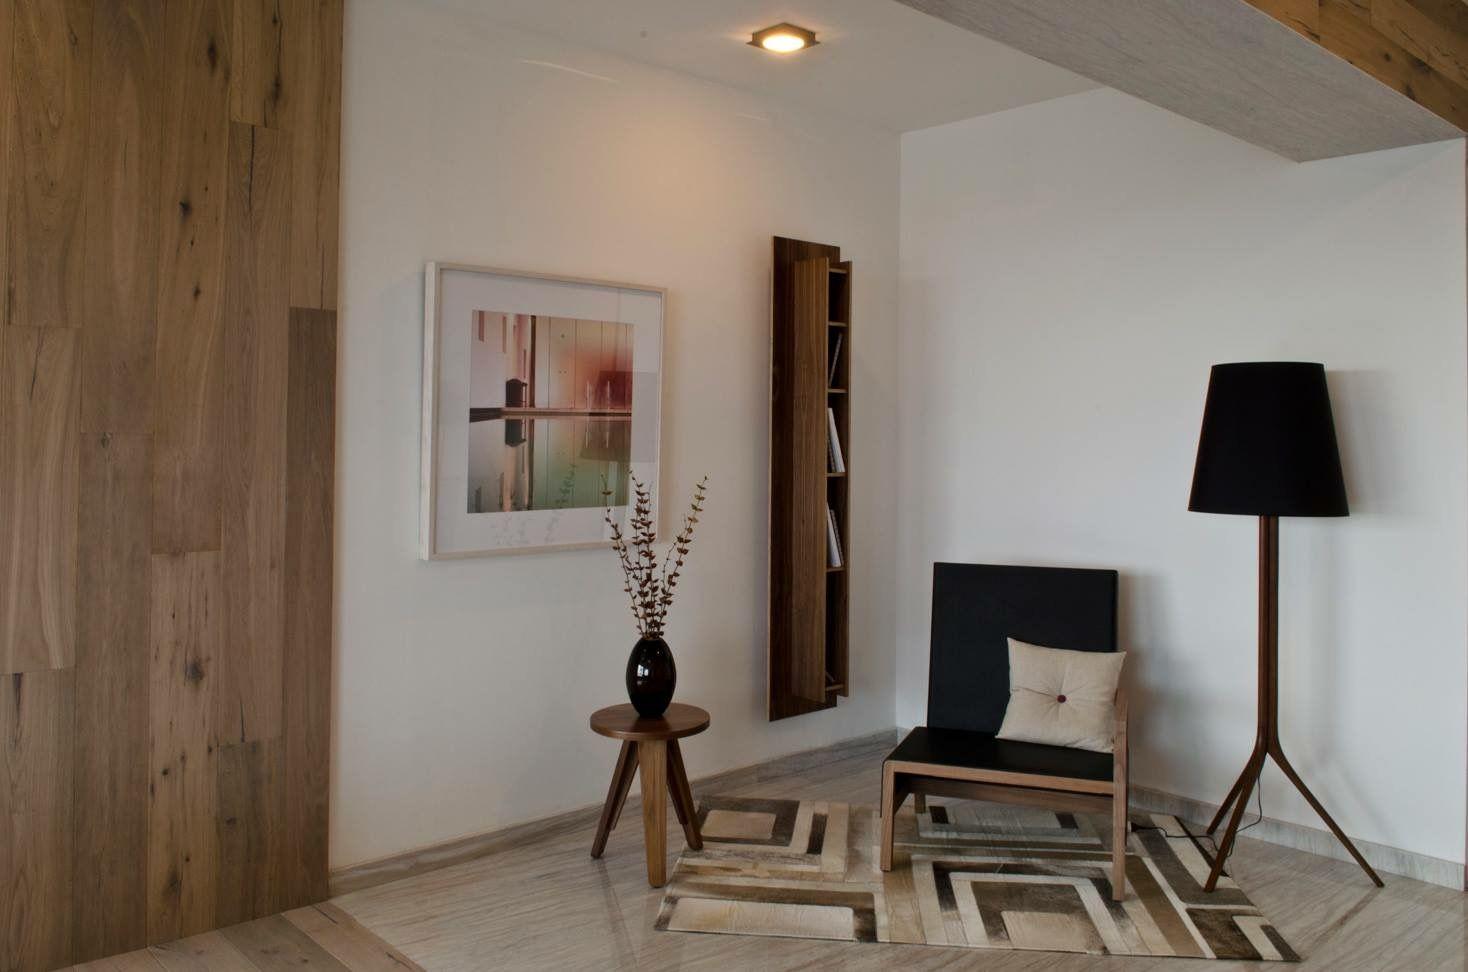 Explore Living Rooms Interior Design and more